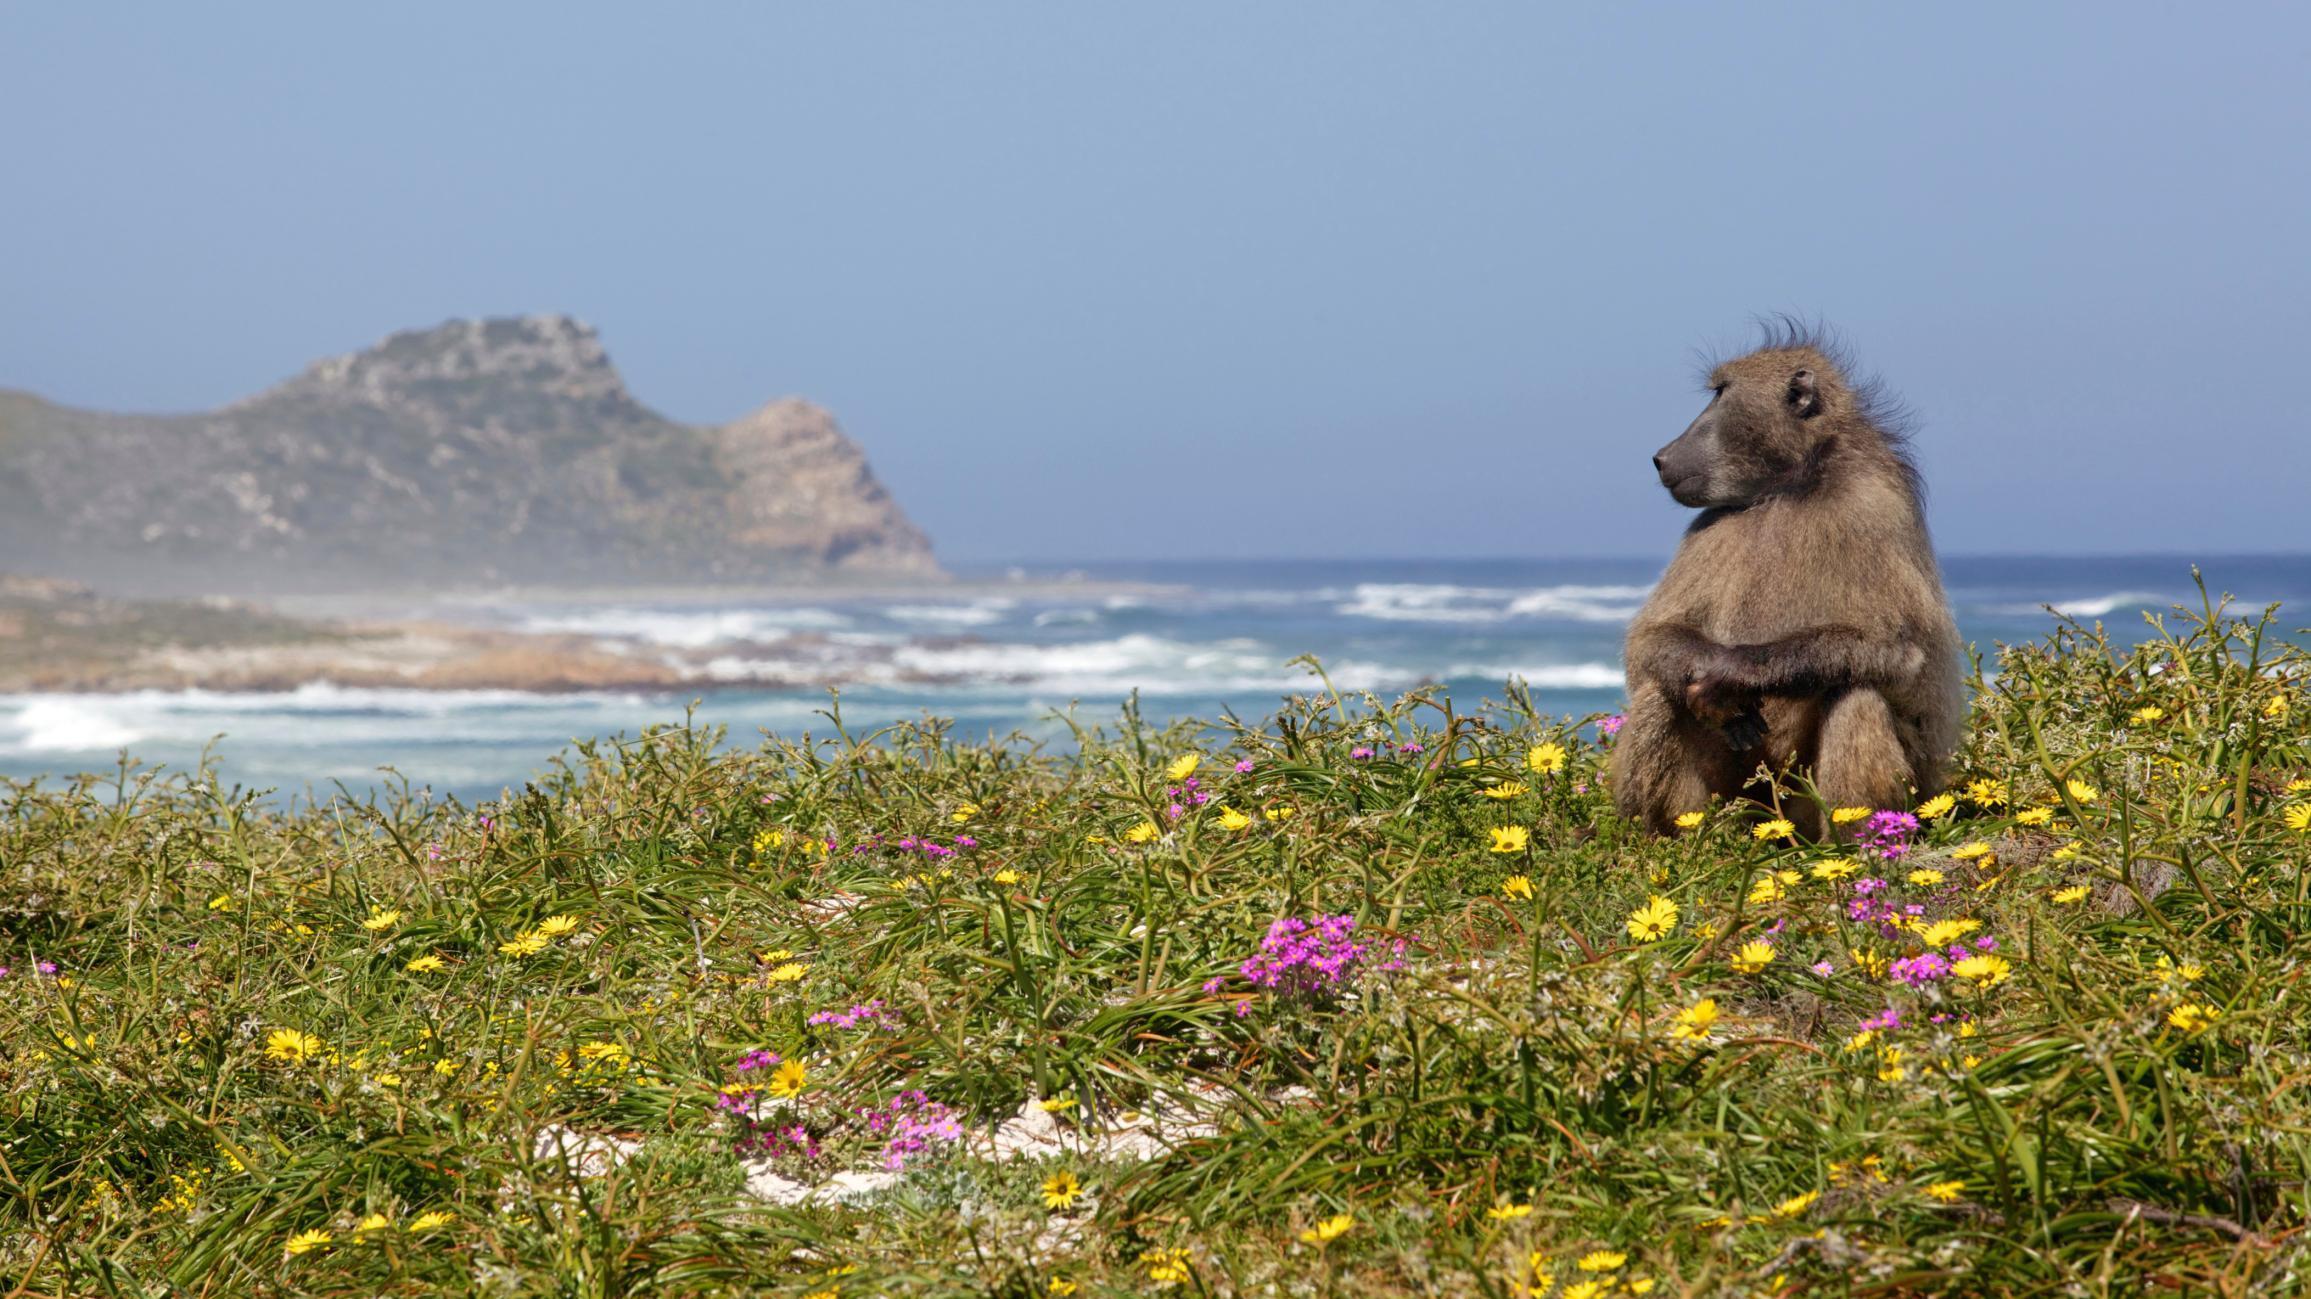 Wildlife Safari Tours from Cape Town